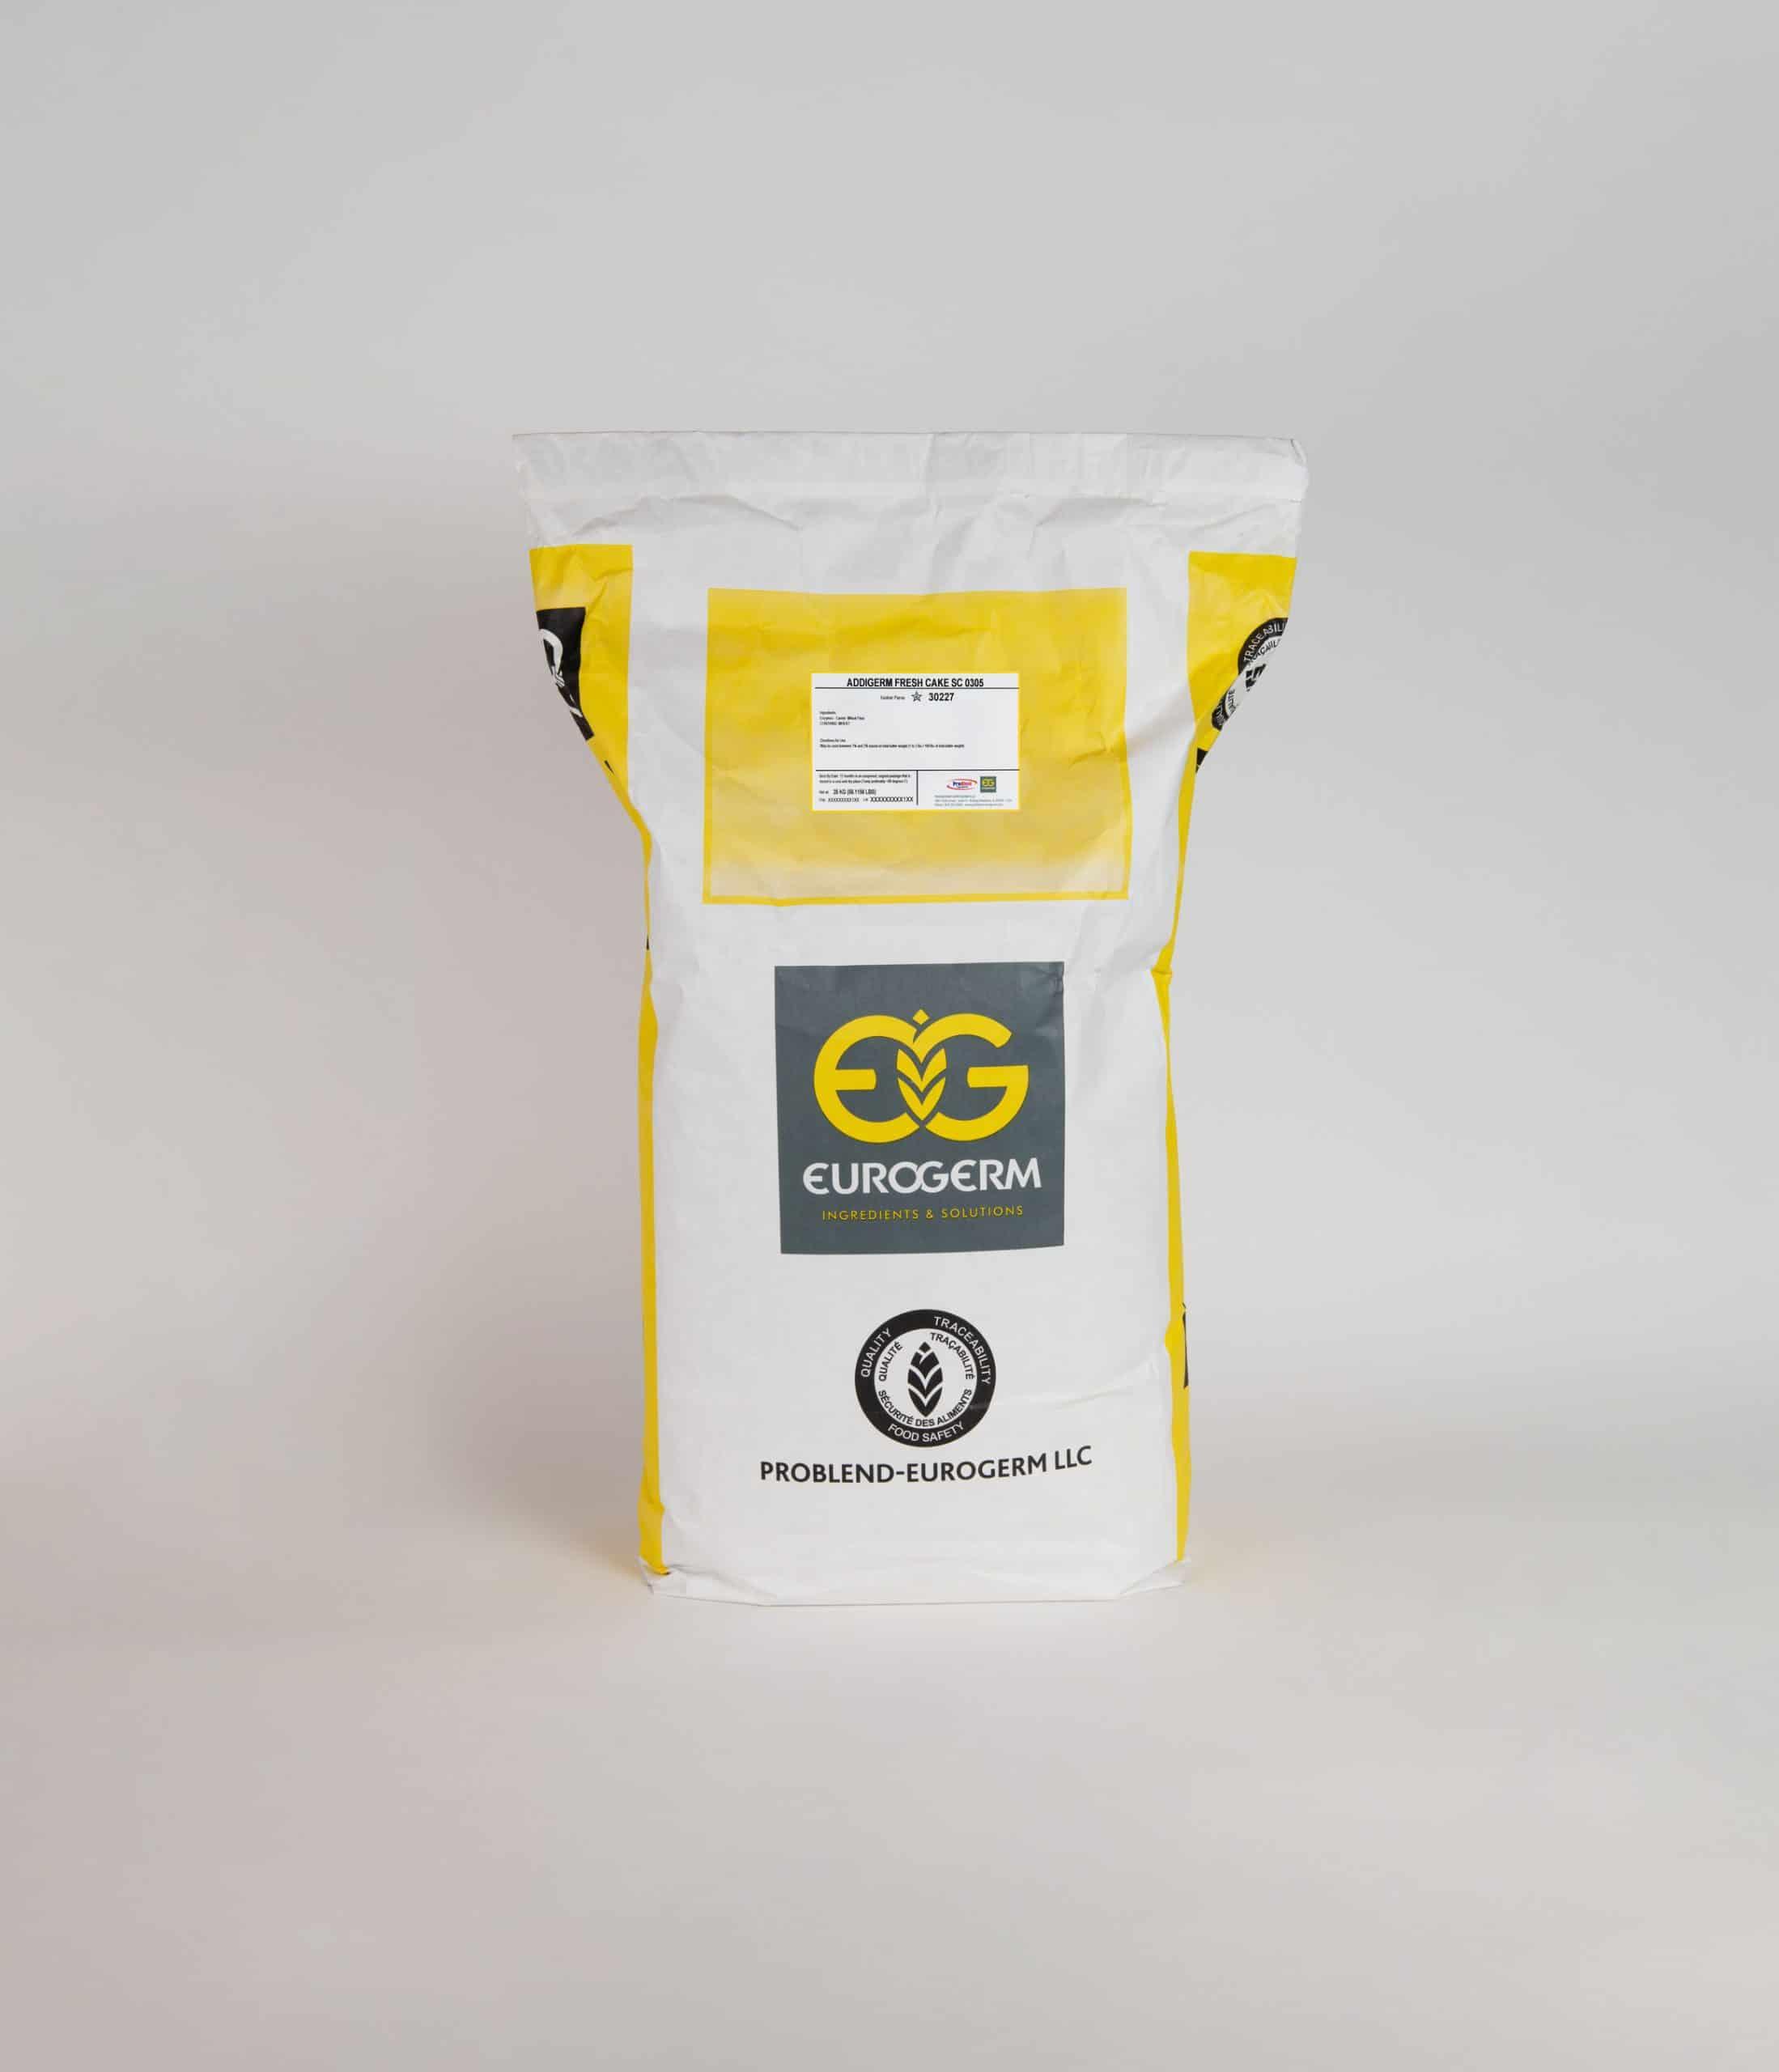 This Addigerm Fresh Cake Sc0305 Us - Cake Muffin Shelf Life Extender (Item#30227 Eurogerm) is your Enzyme based shelf...